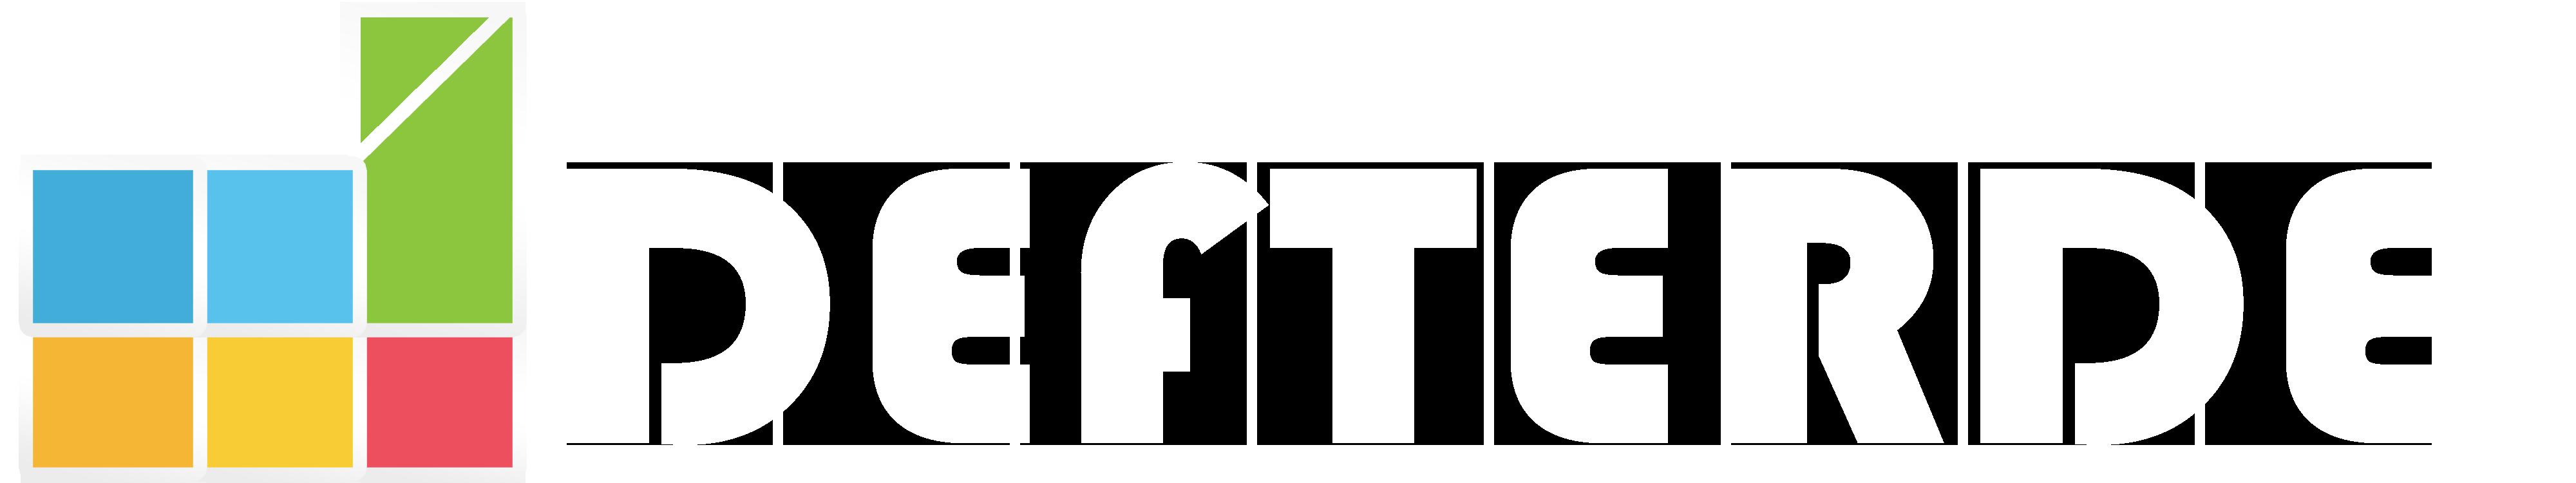 Defterde Logo